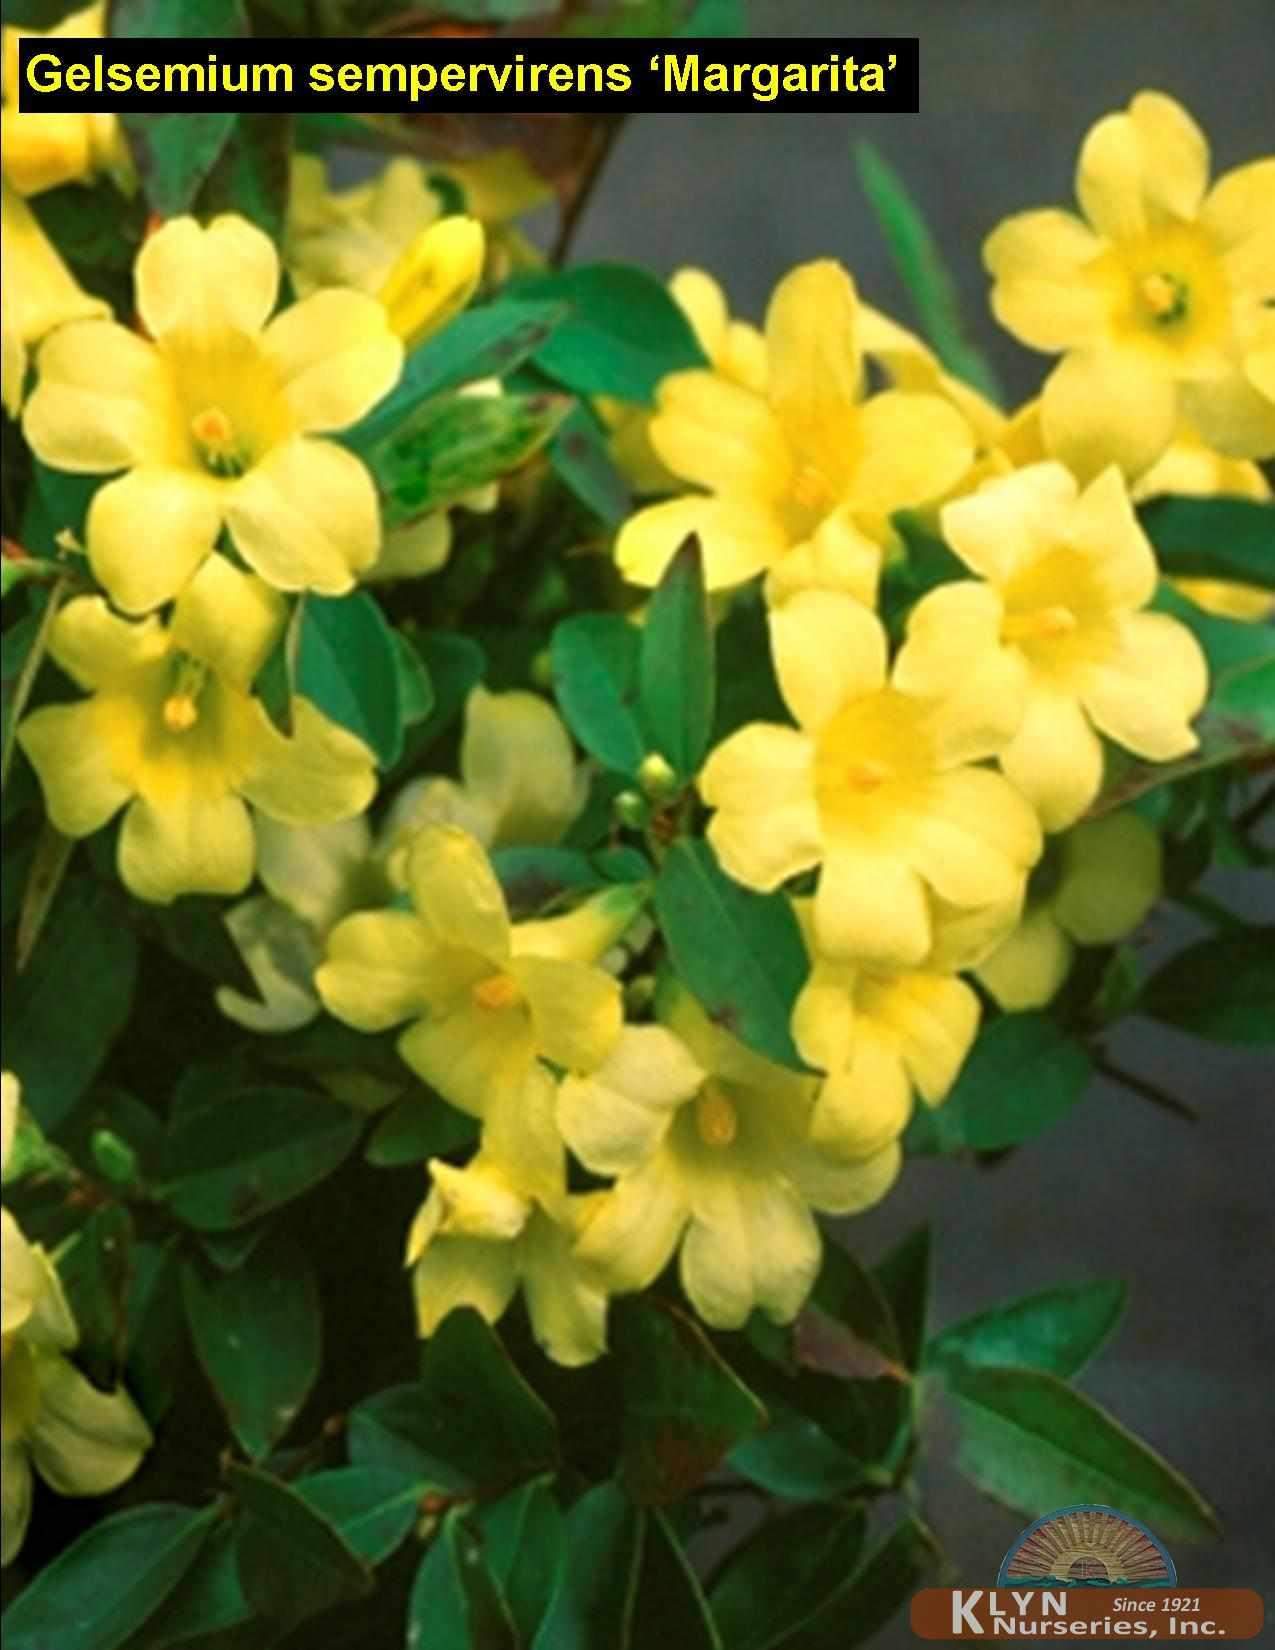 Gelsemium sempervirens margarita klyn nurseries inc gelsemium s margarita 2 izmirmasajfo